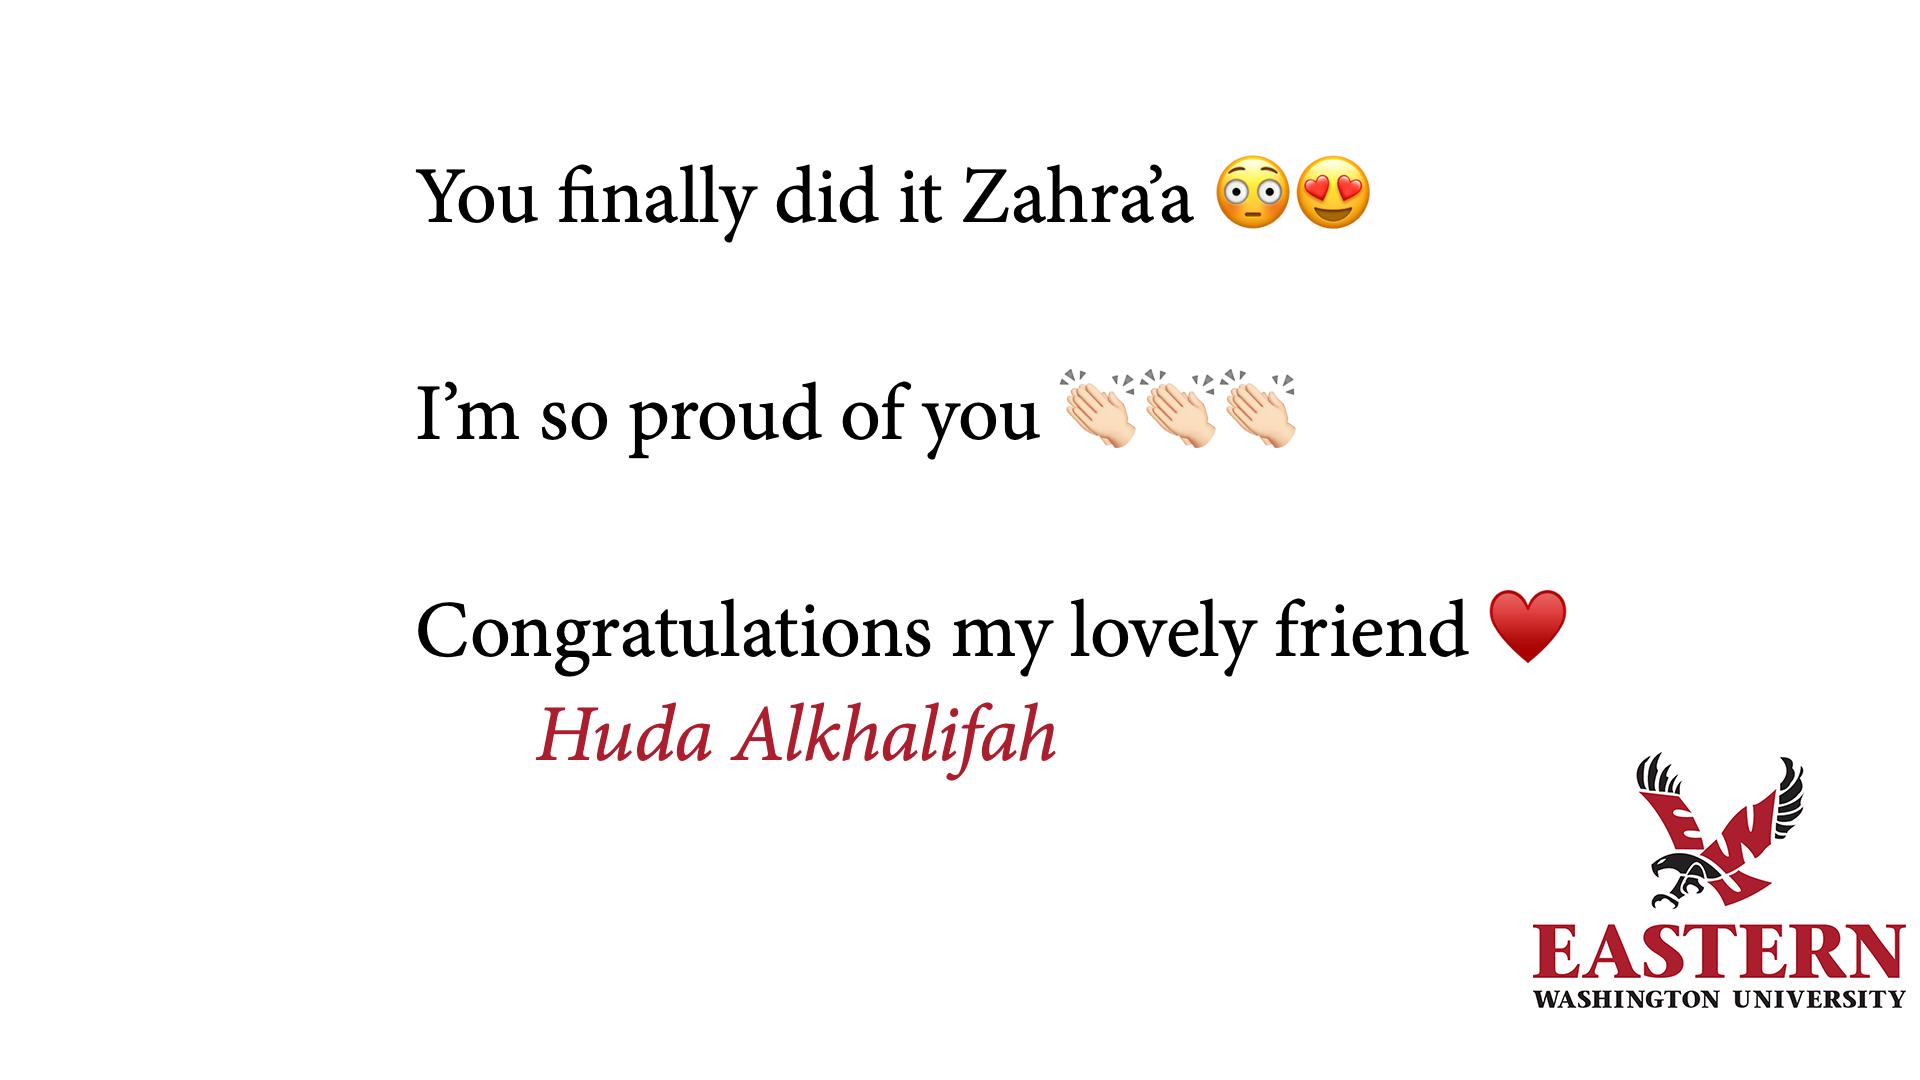 tbi_zahra-ali-y-alhamili_1330.png